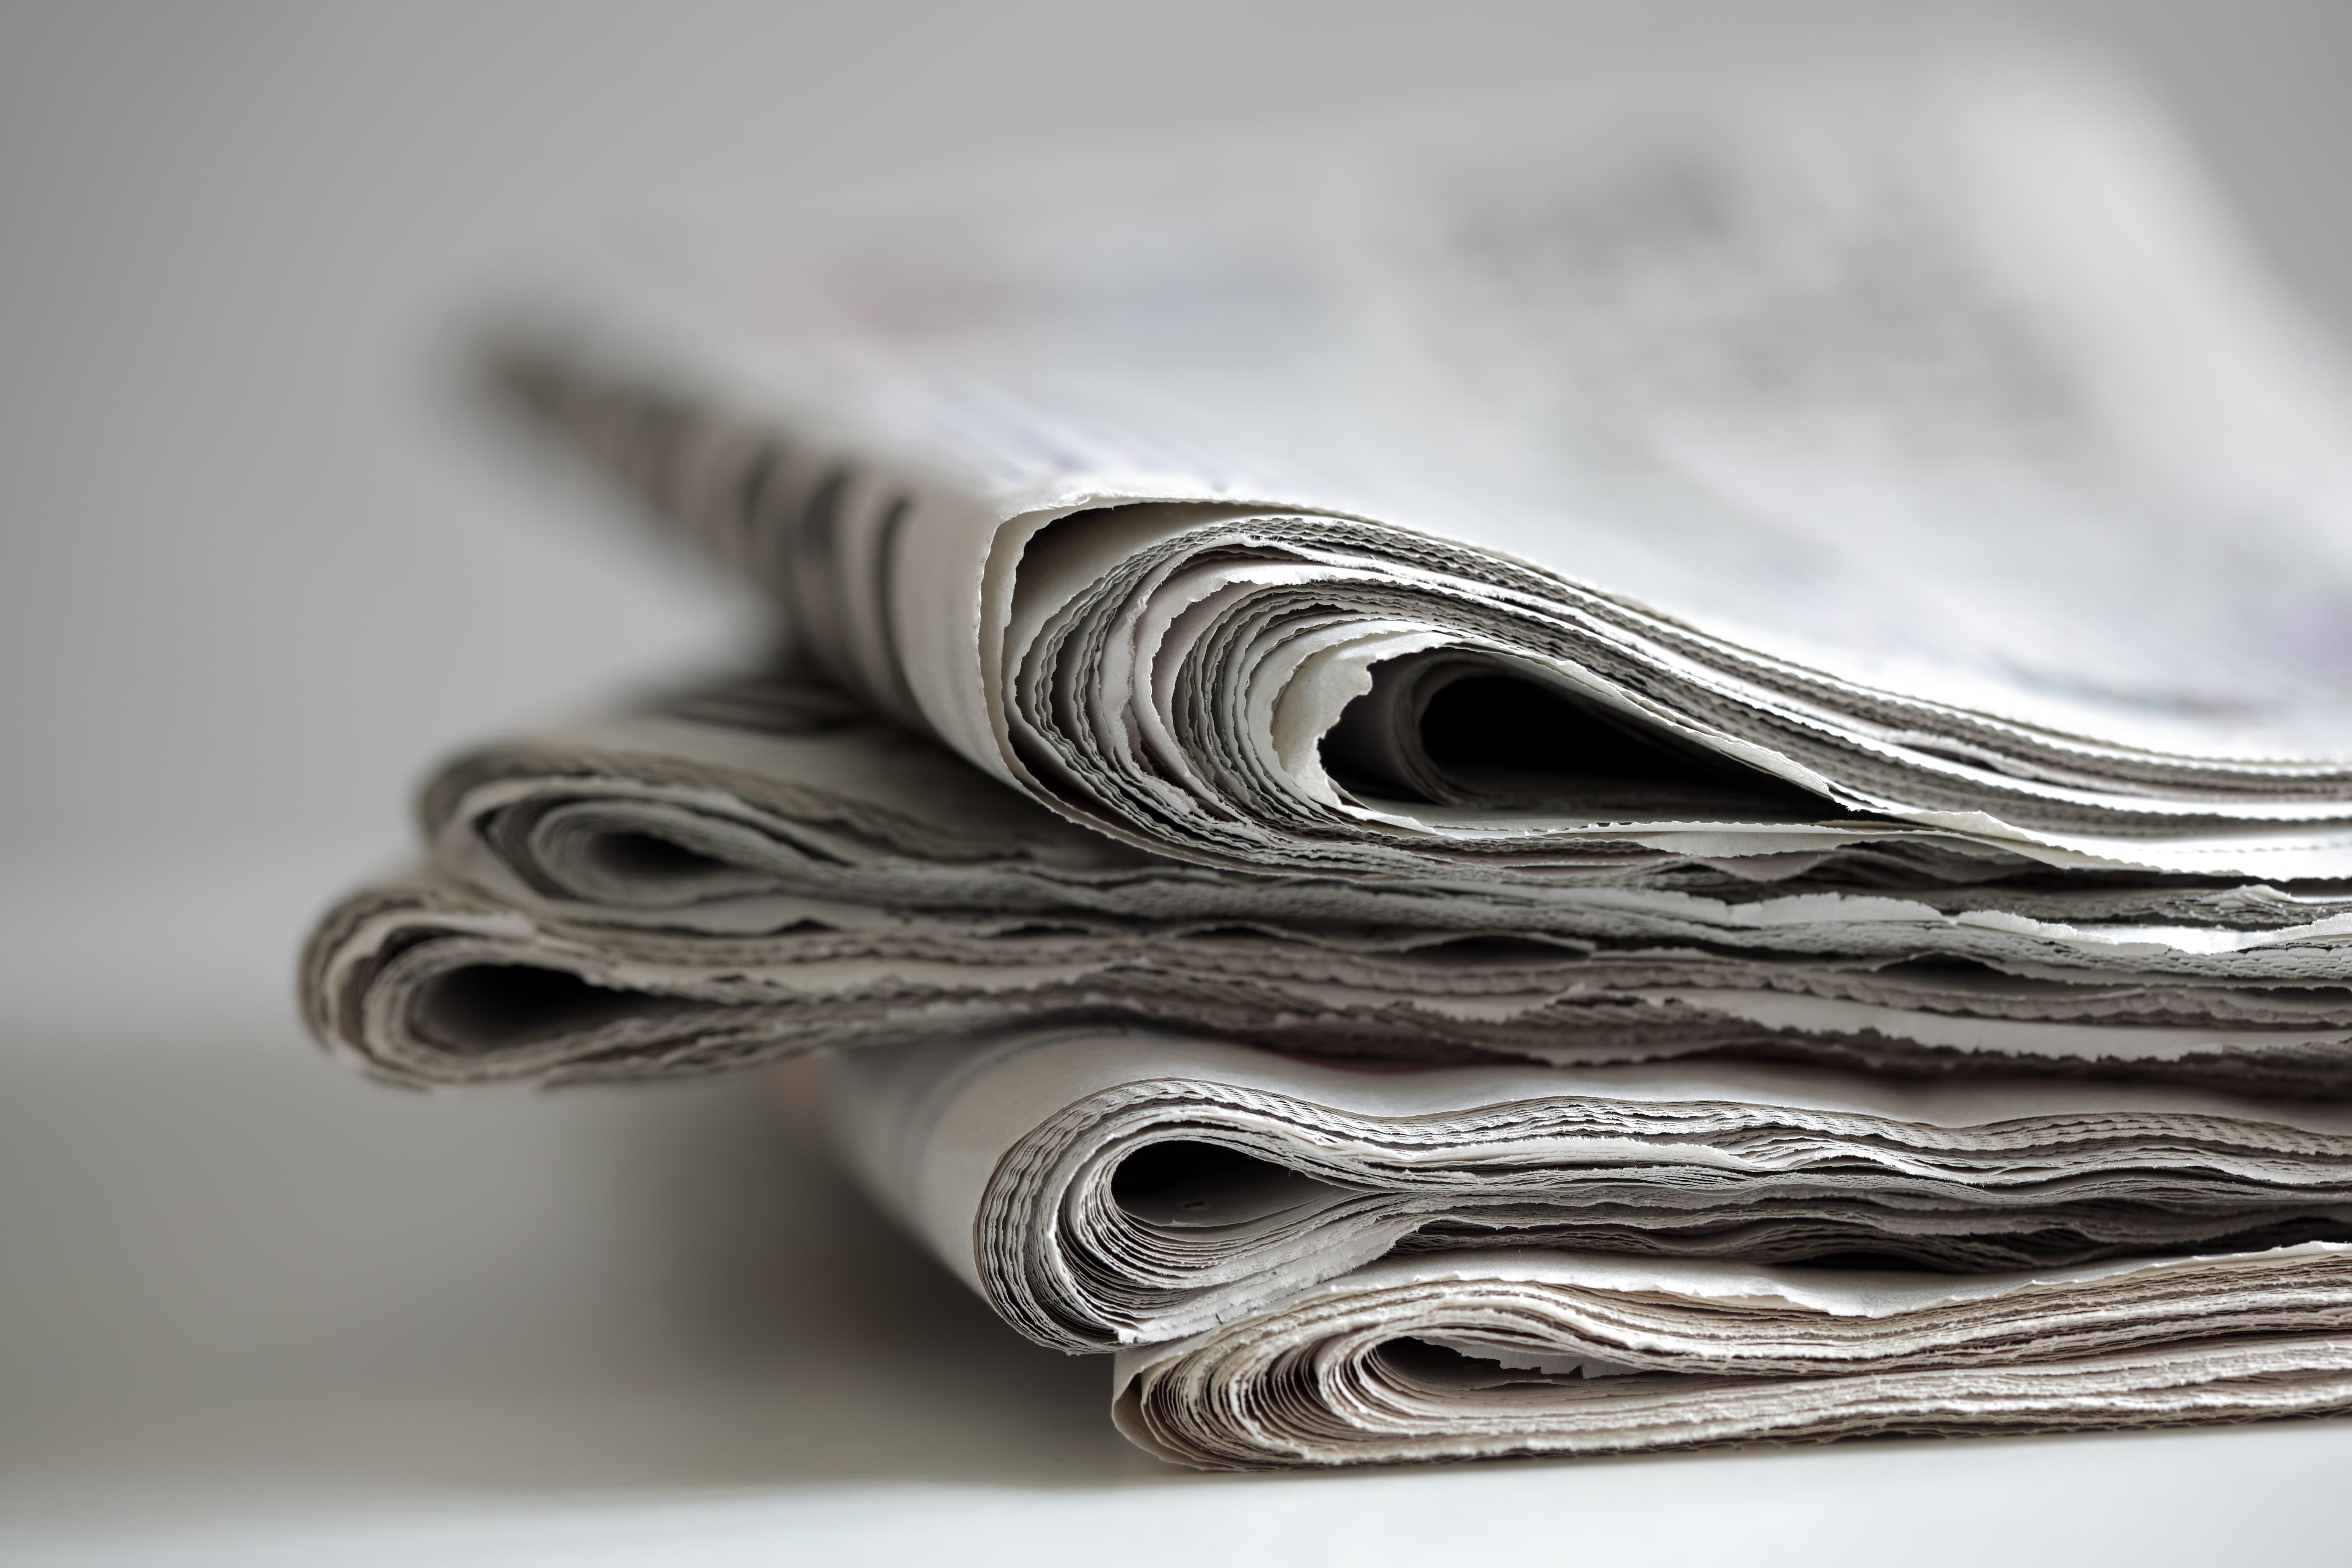 Best Press Release Distribution Services – 2019